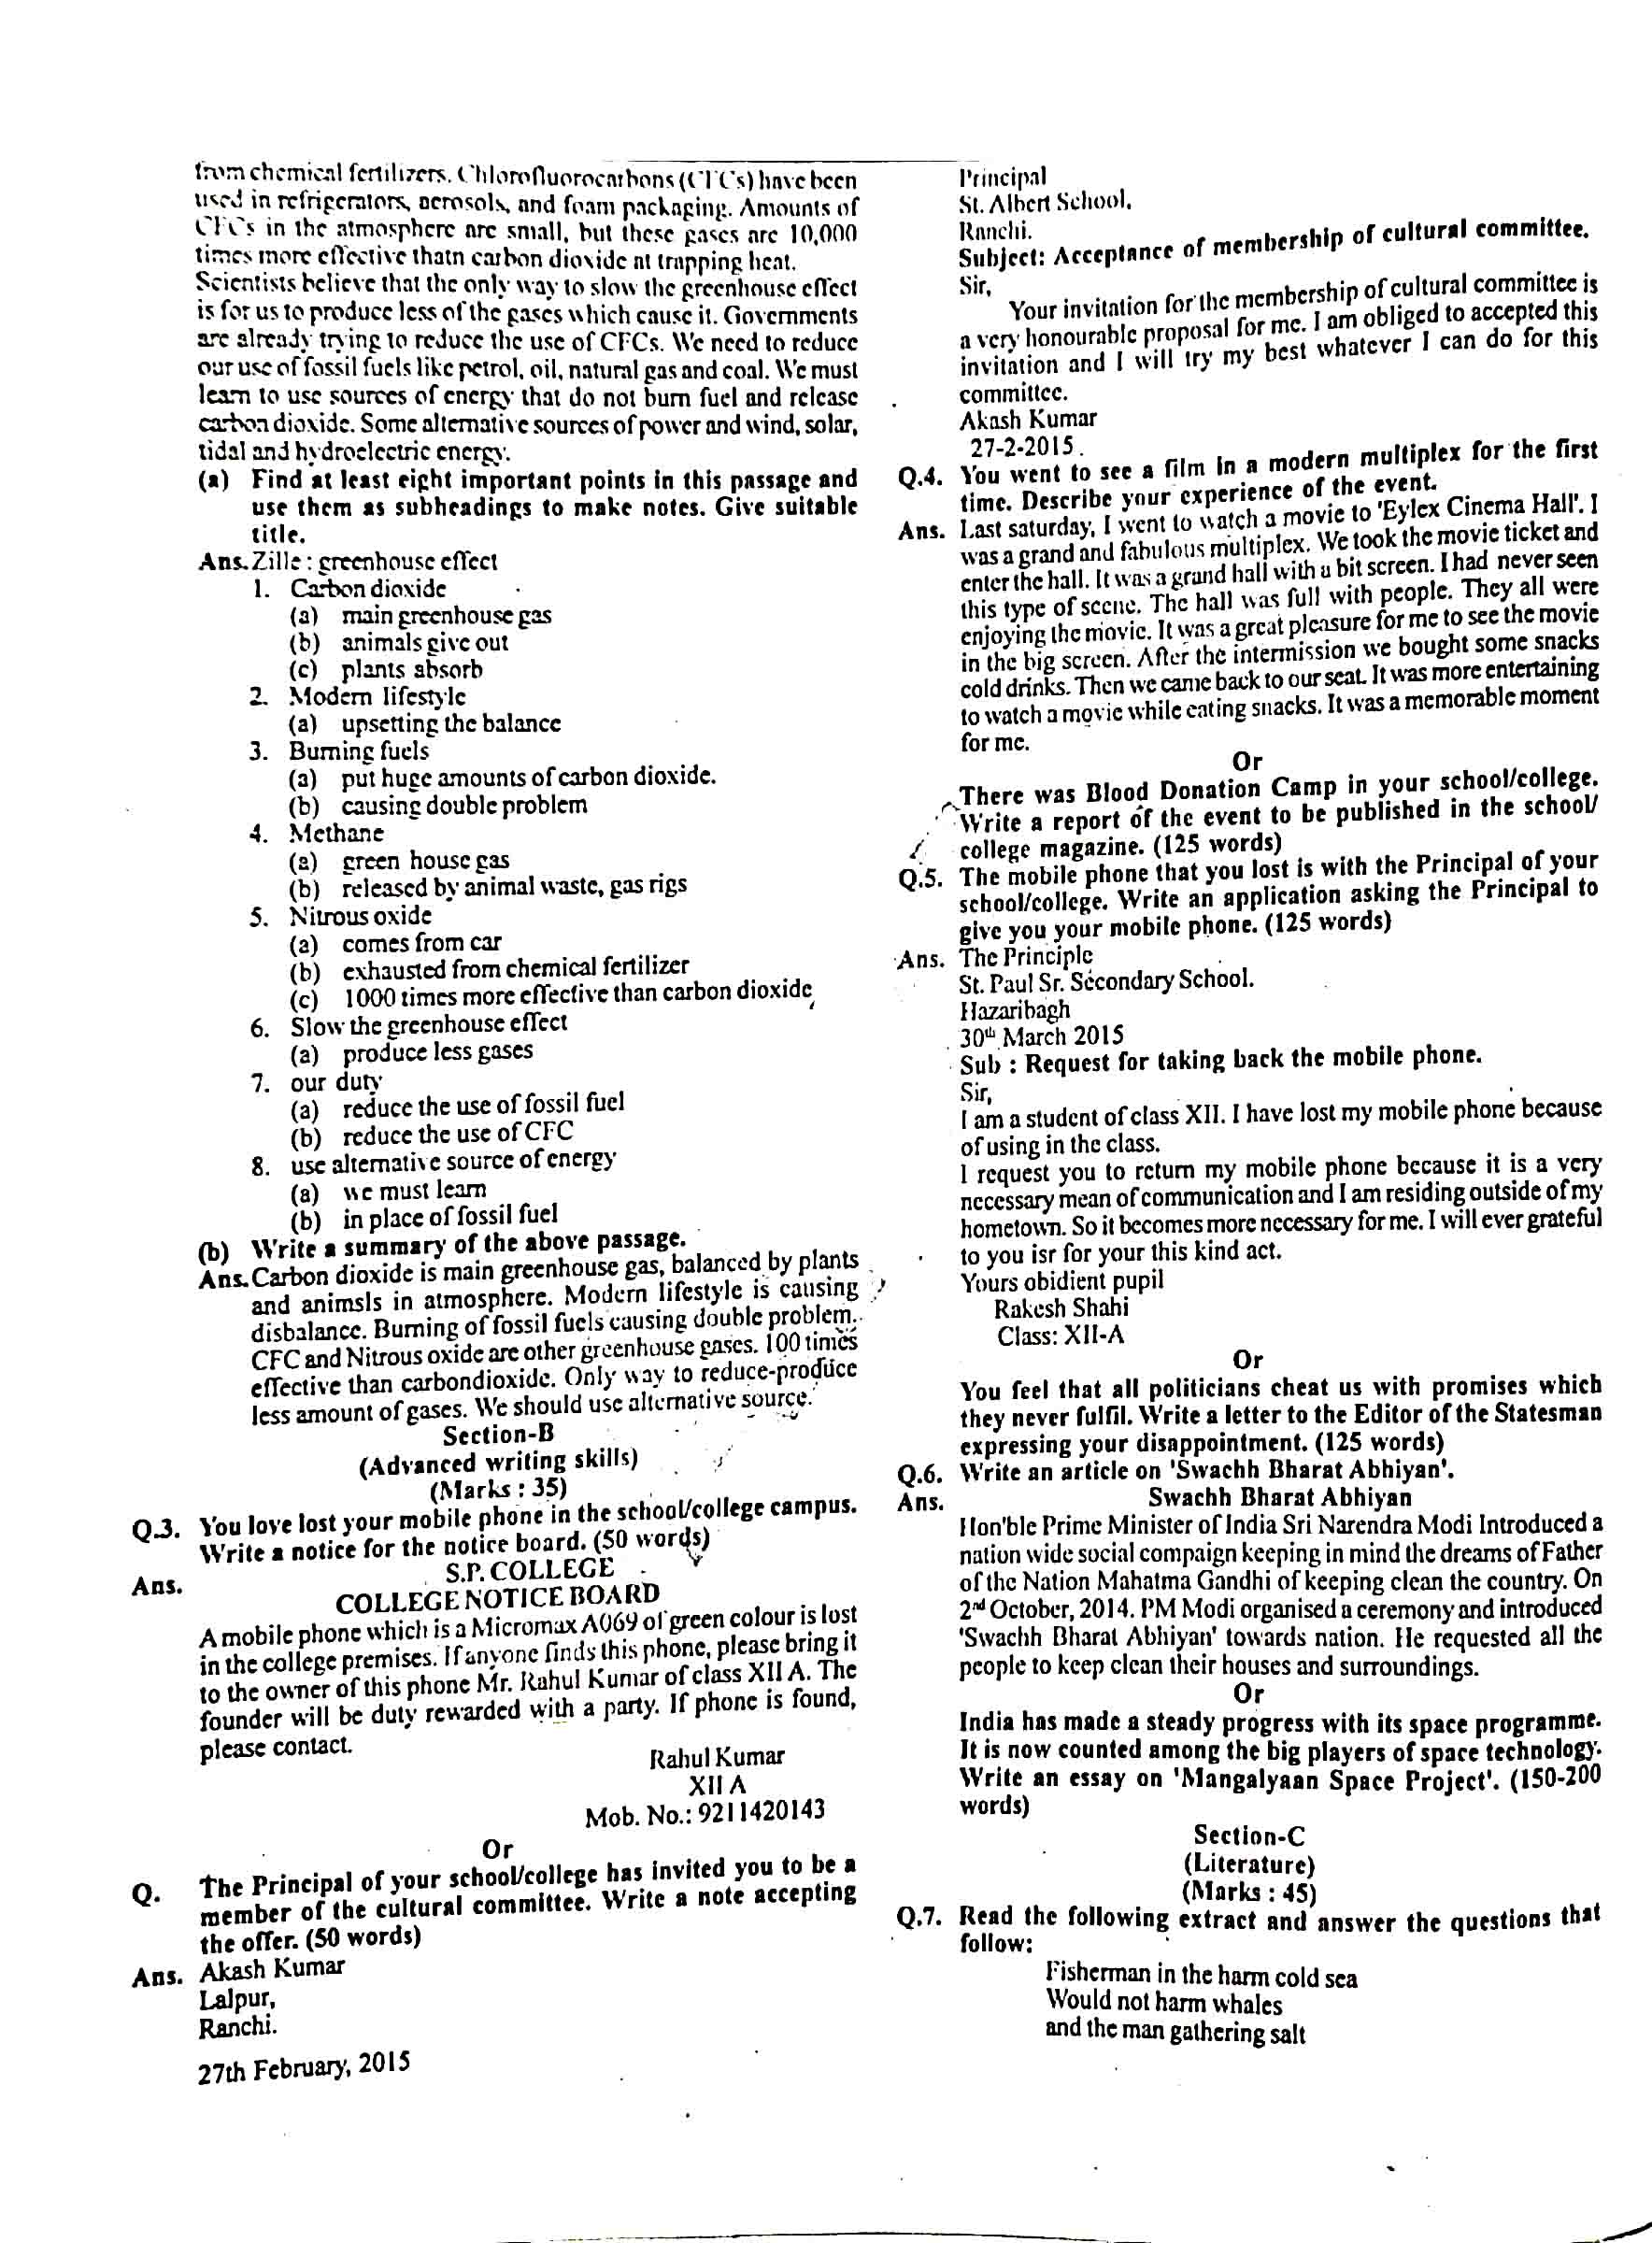 JAC Class 12 english-core 2015 Question Paper 02